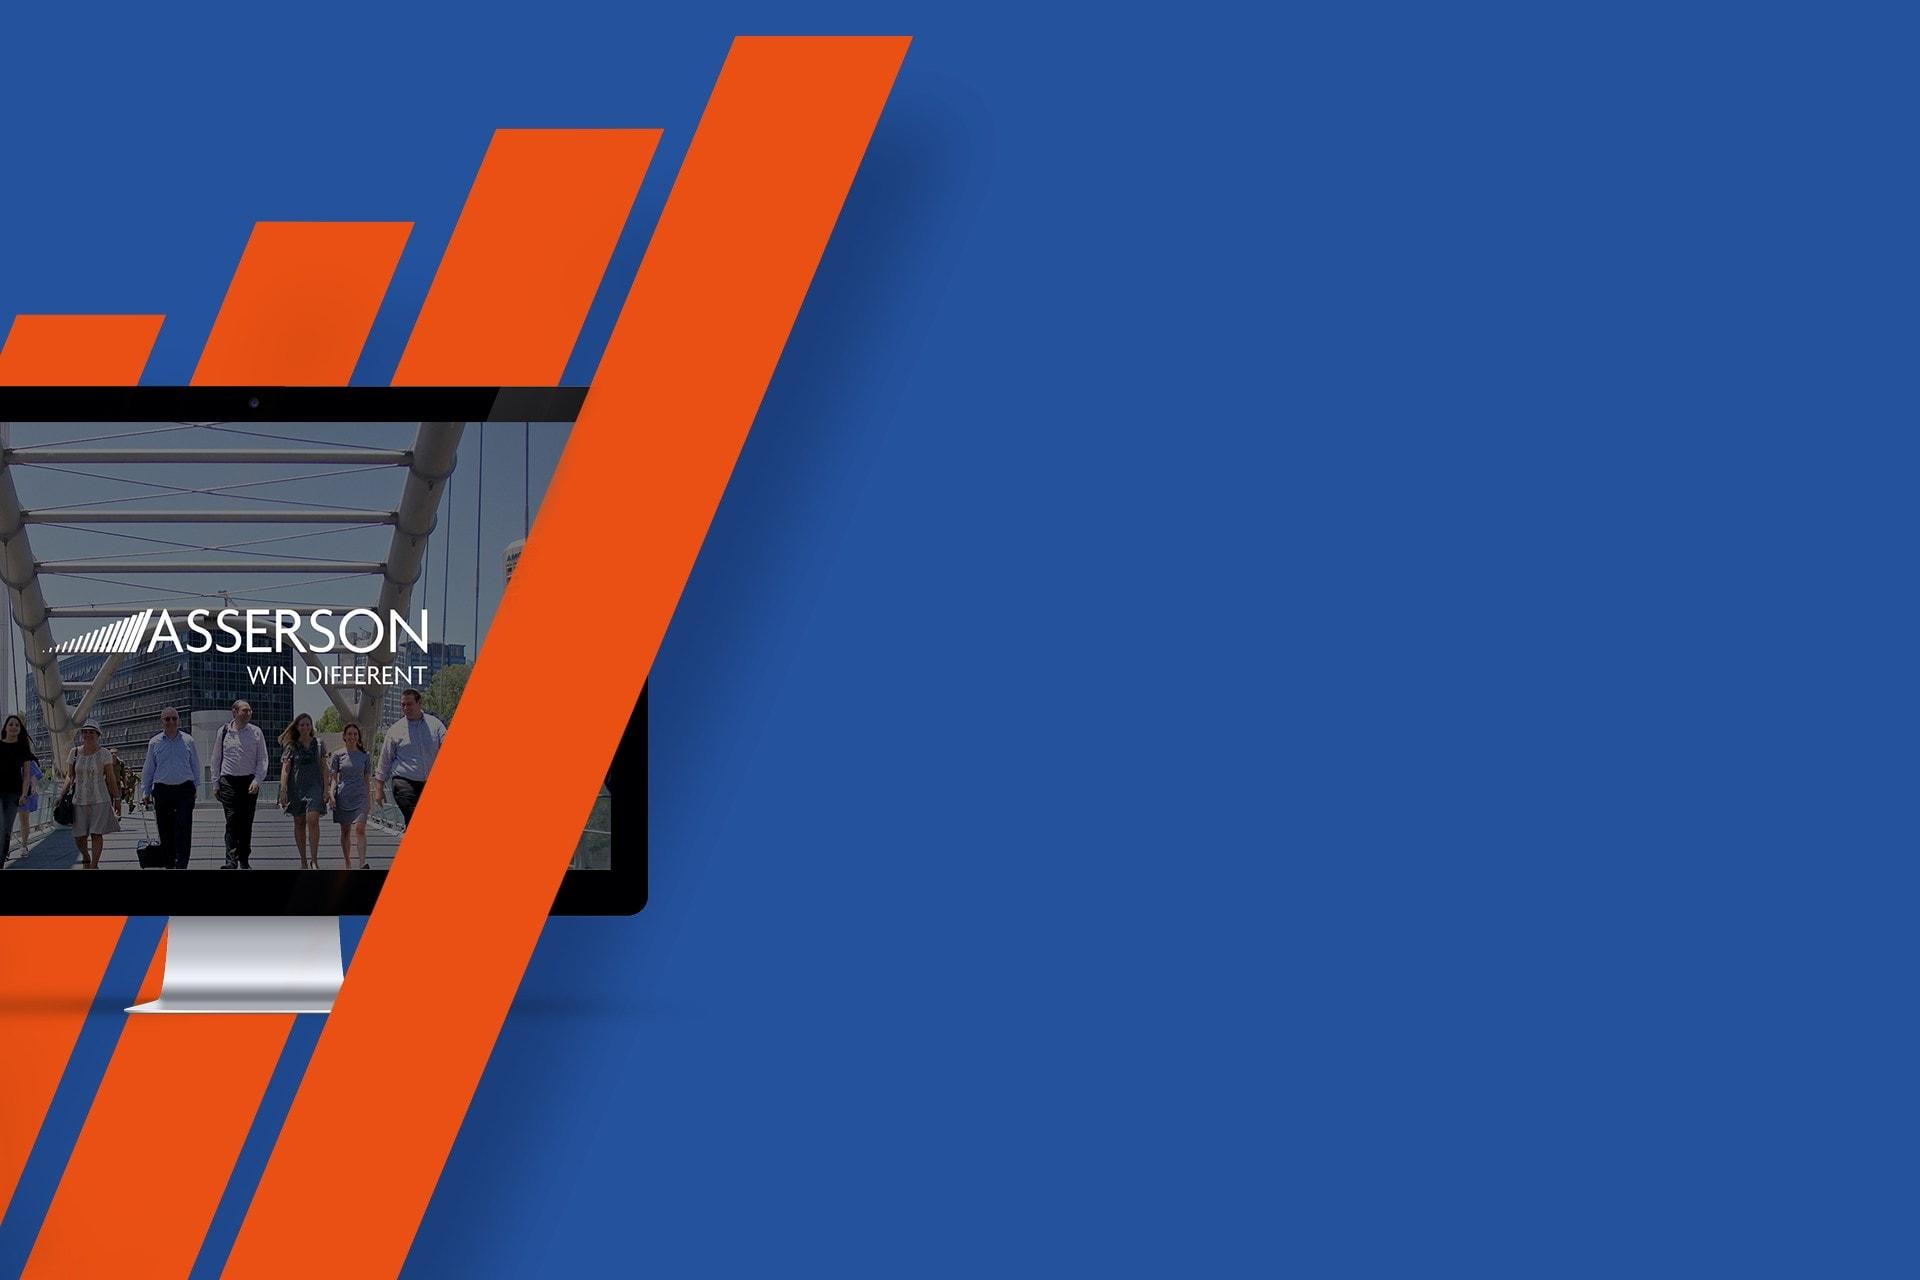 asserson-banner - Natie Branding Agency